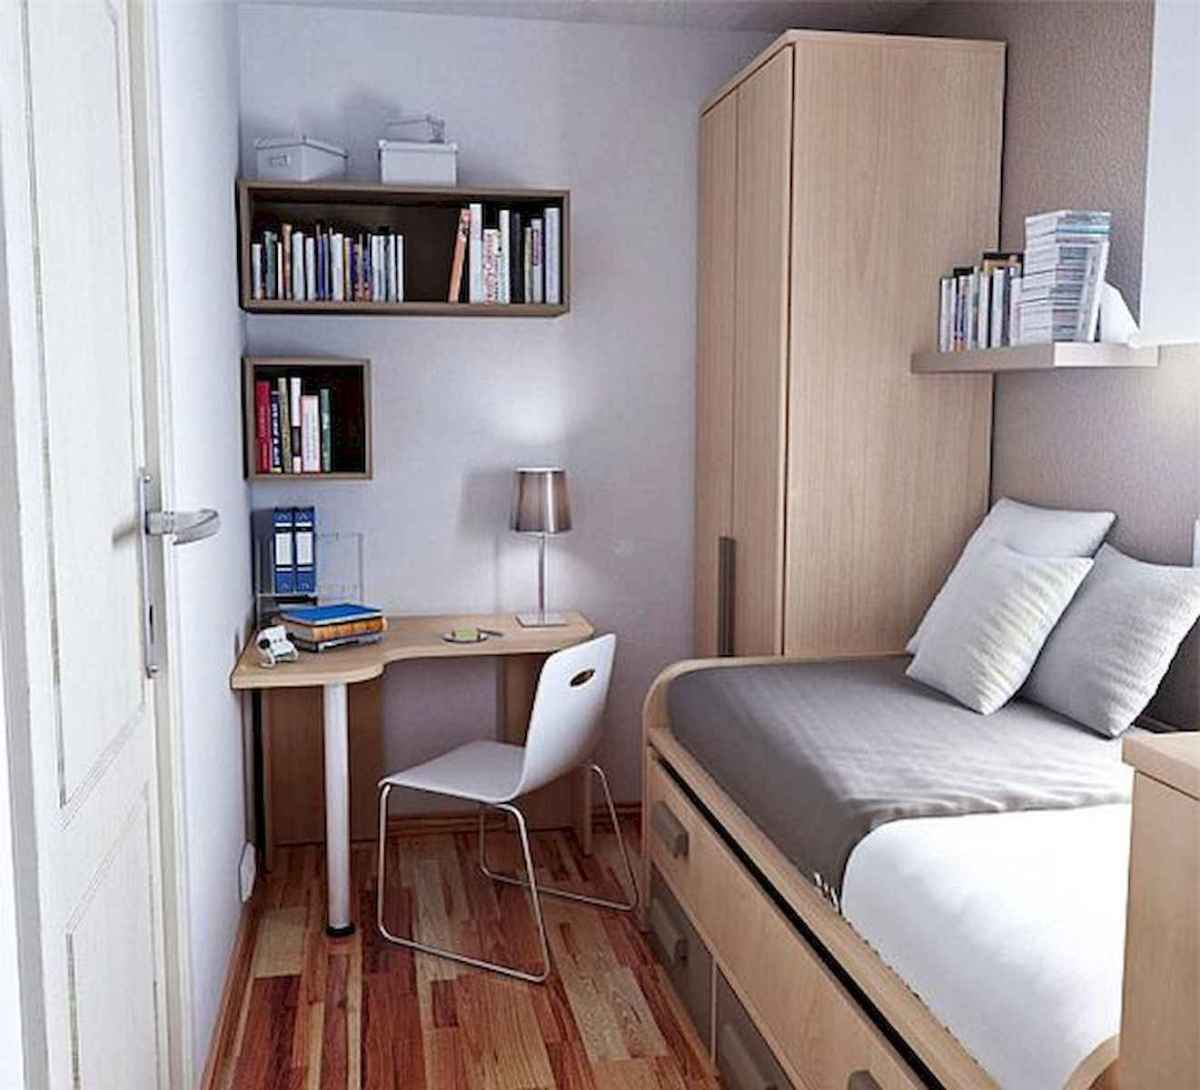 80 Fantastic Small Apartment Bedroom College Design Ideas and Decor (49)